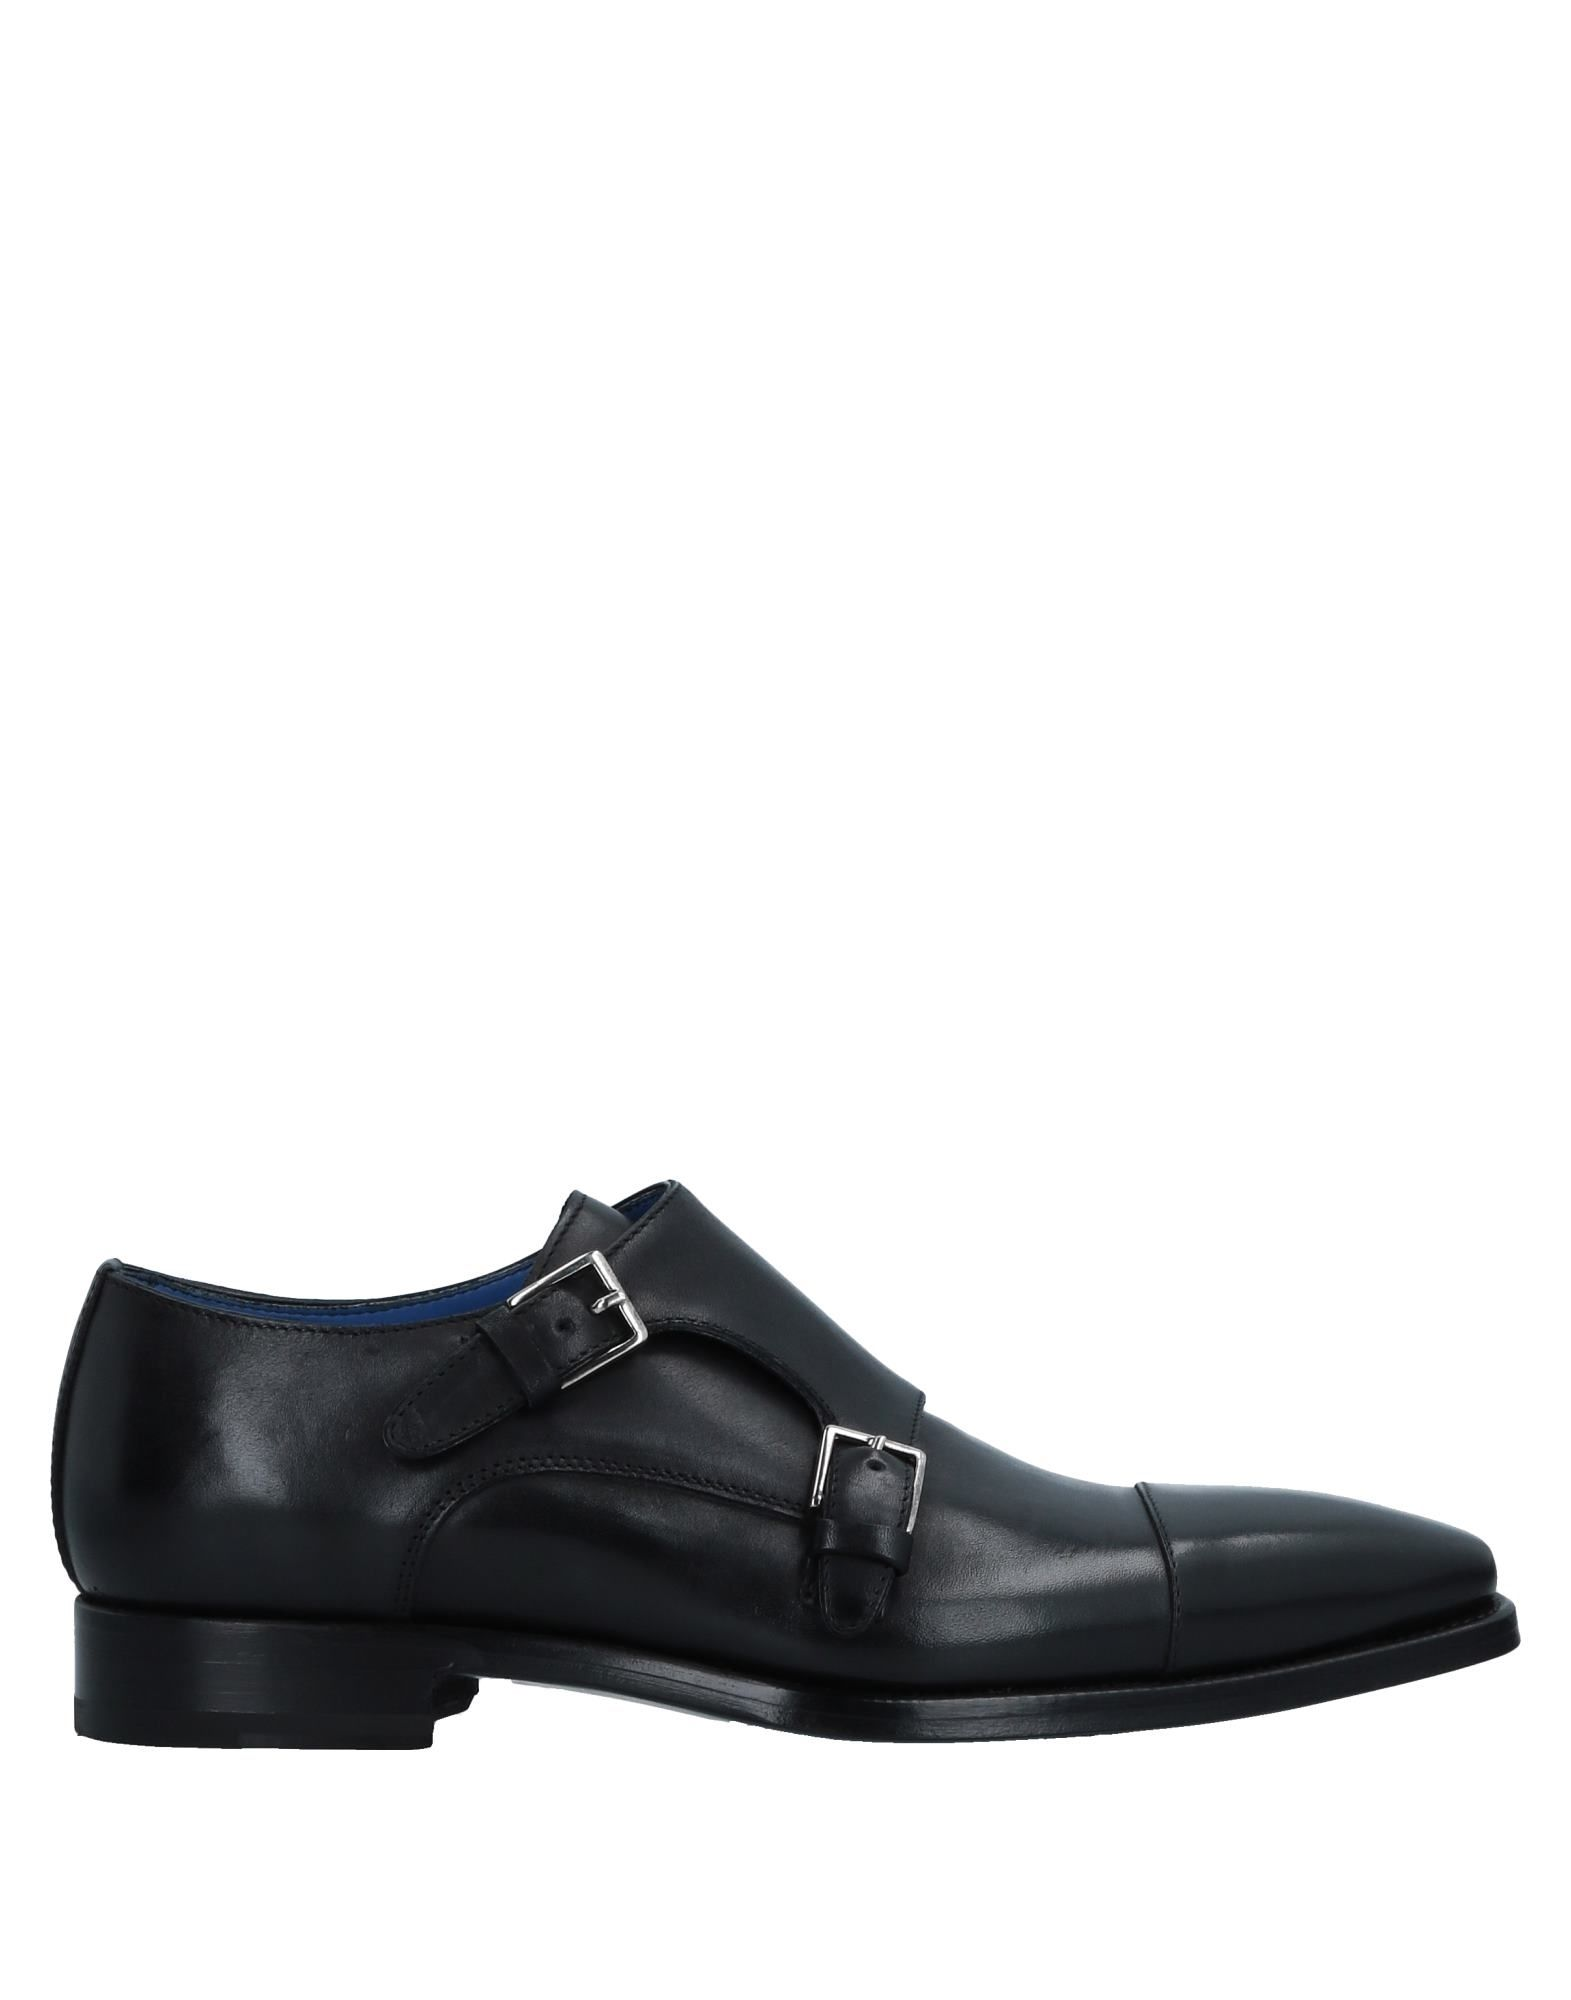 Stefano Branchini Mokassins Herren  11521123HN Gute Qualität beliebte Schuhe